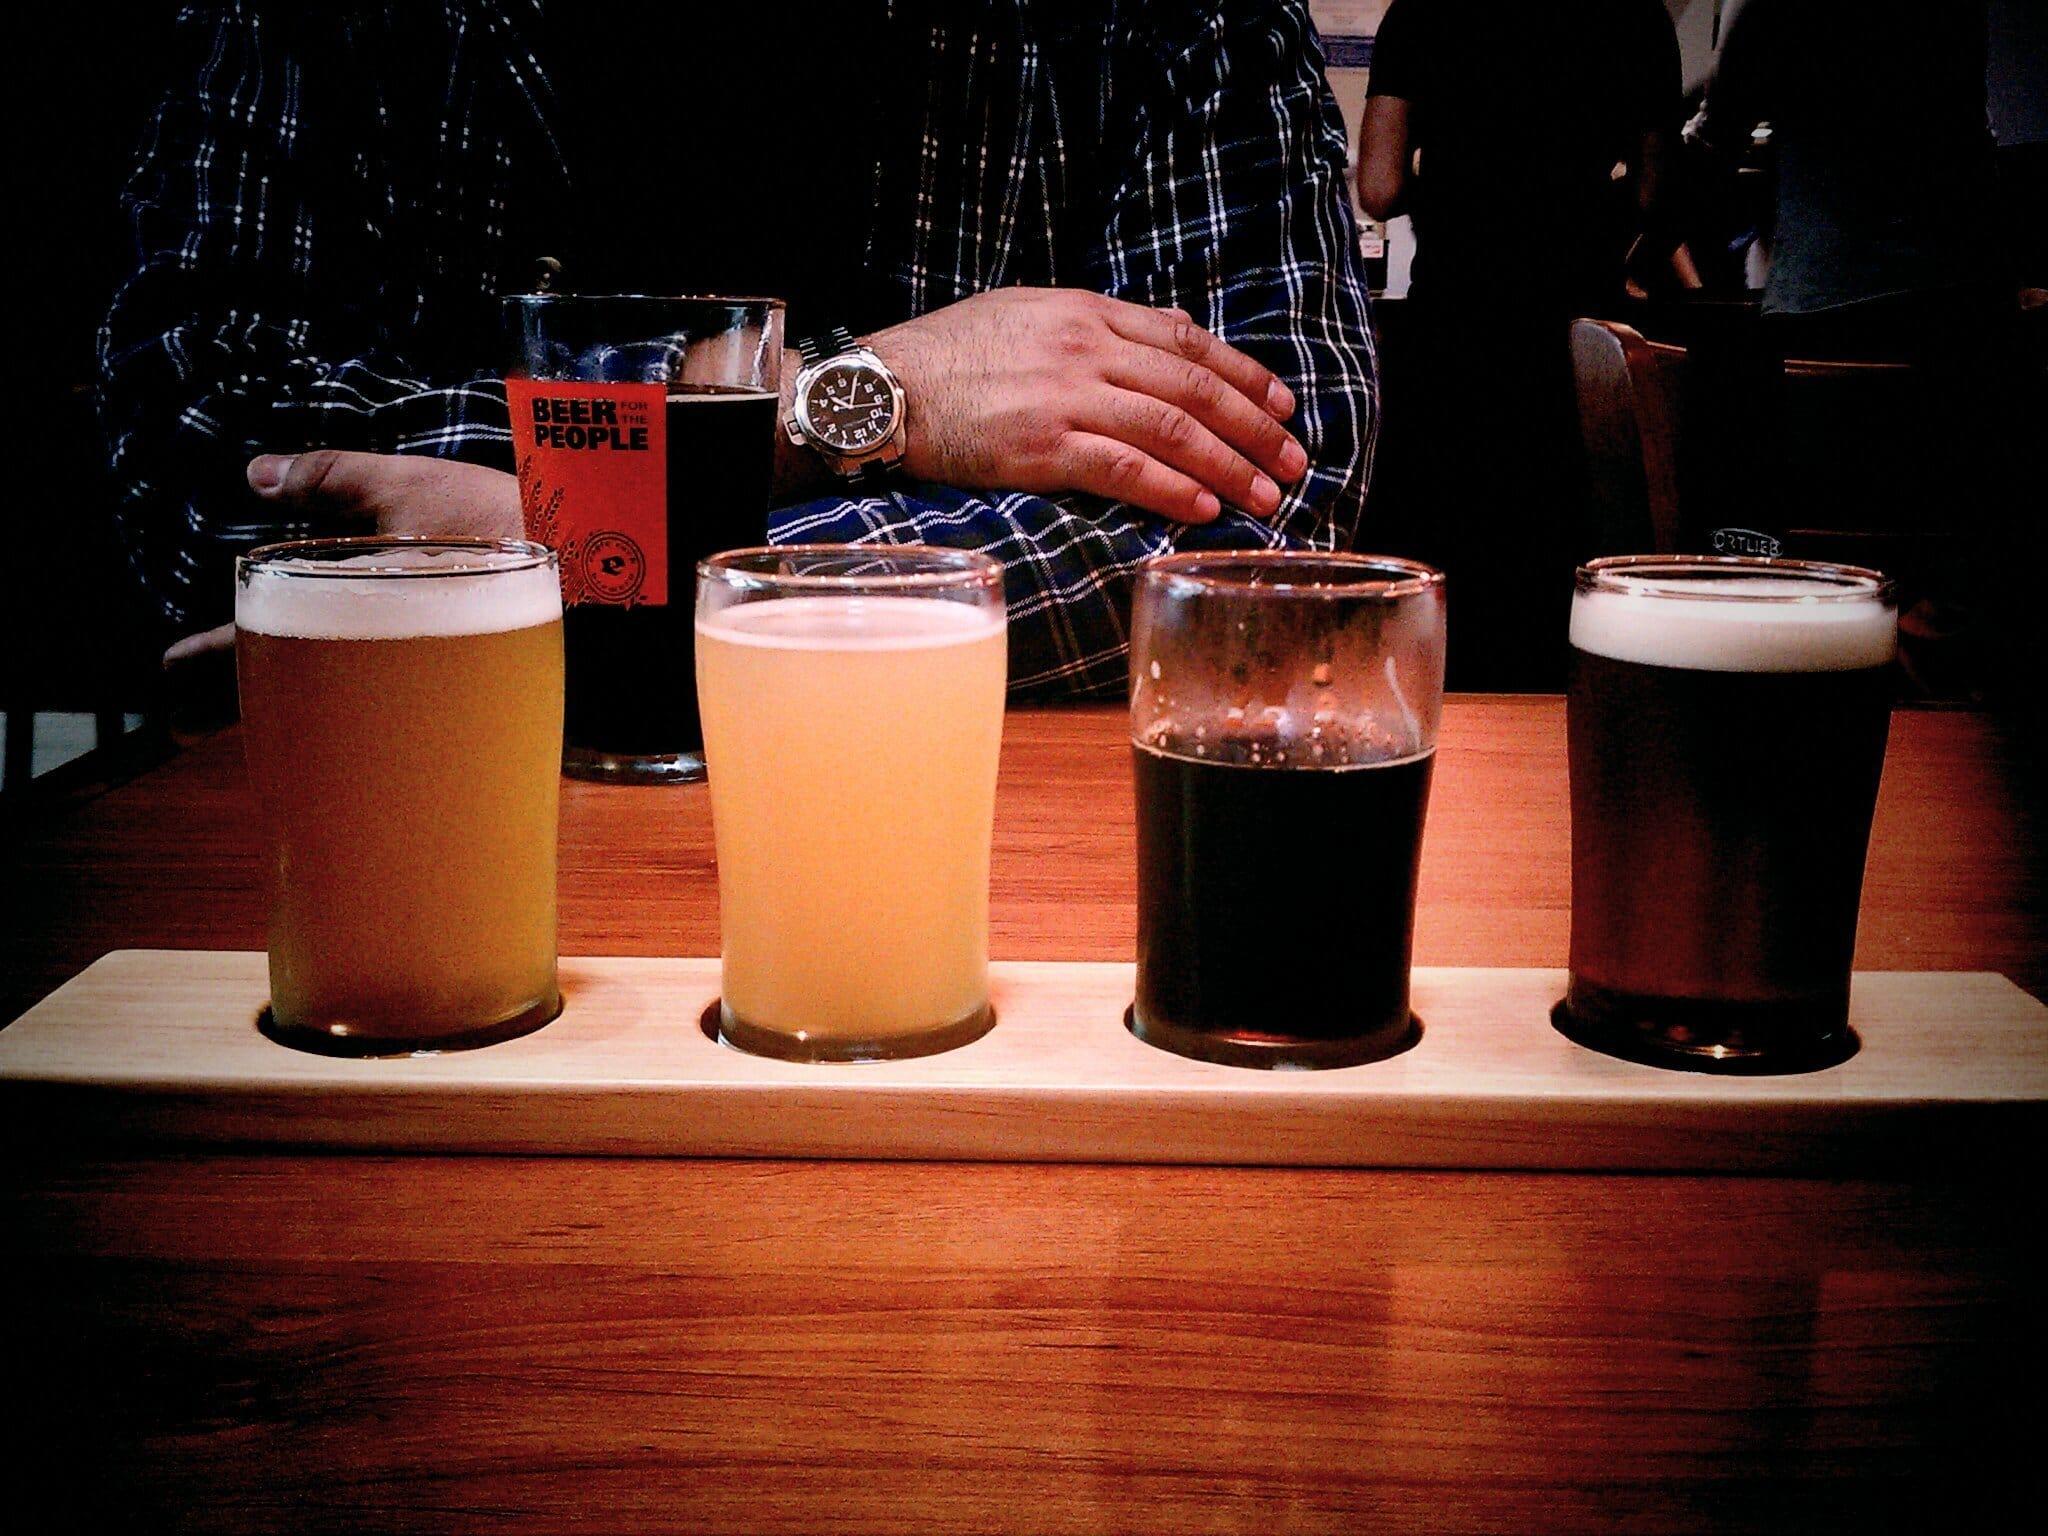 Eagle Rock Brewery - Los Angeles, California - List of California Breweries